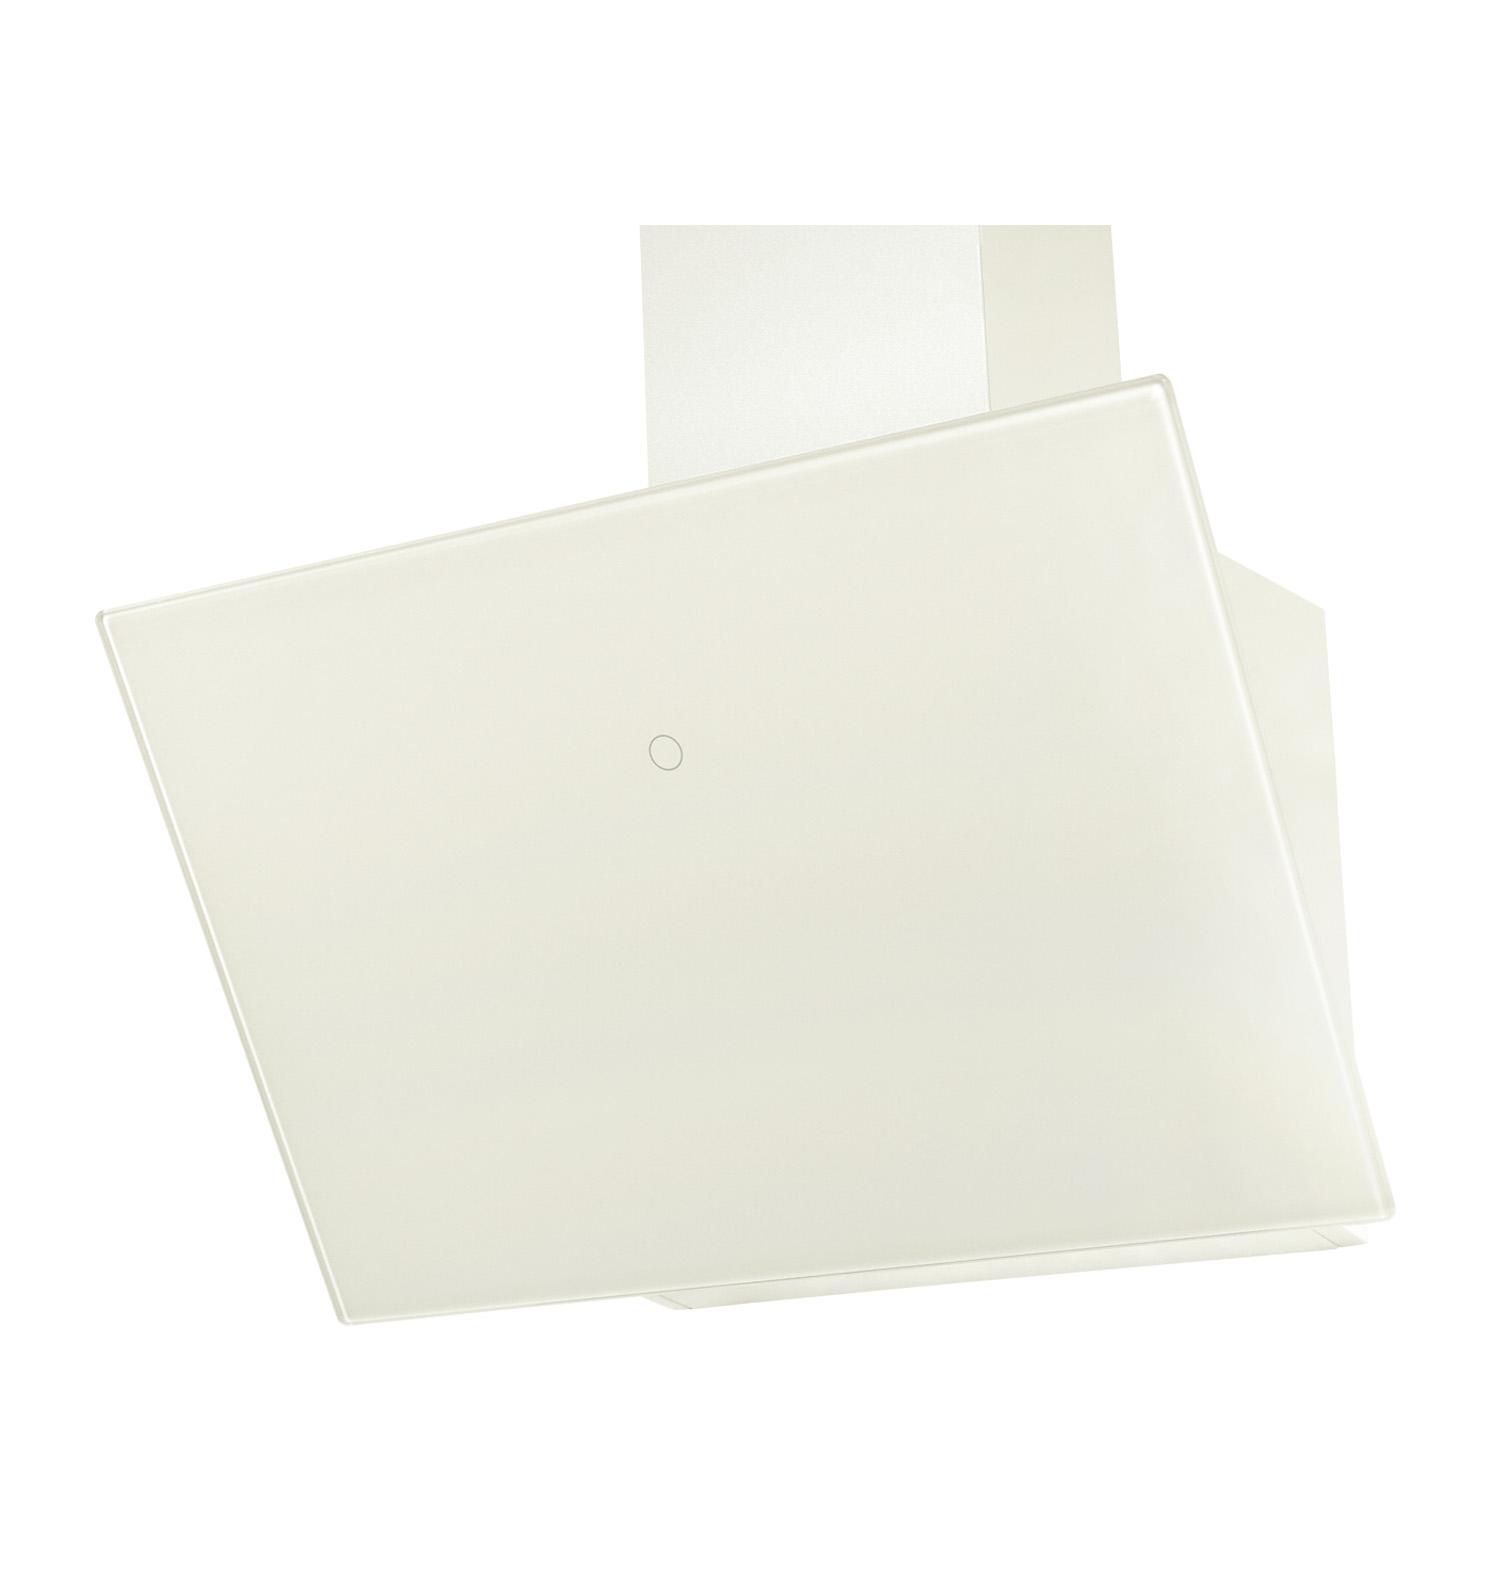 LEX Touch 600 Ivory Light Белый антик